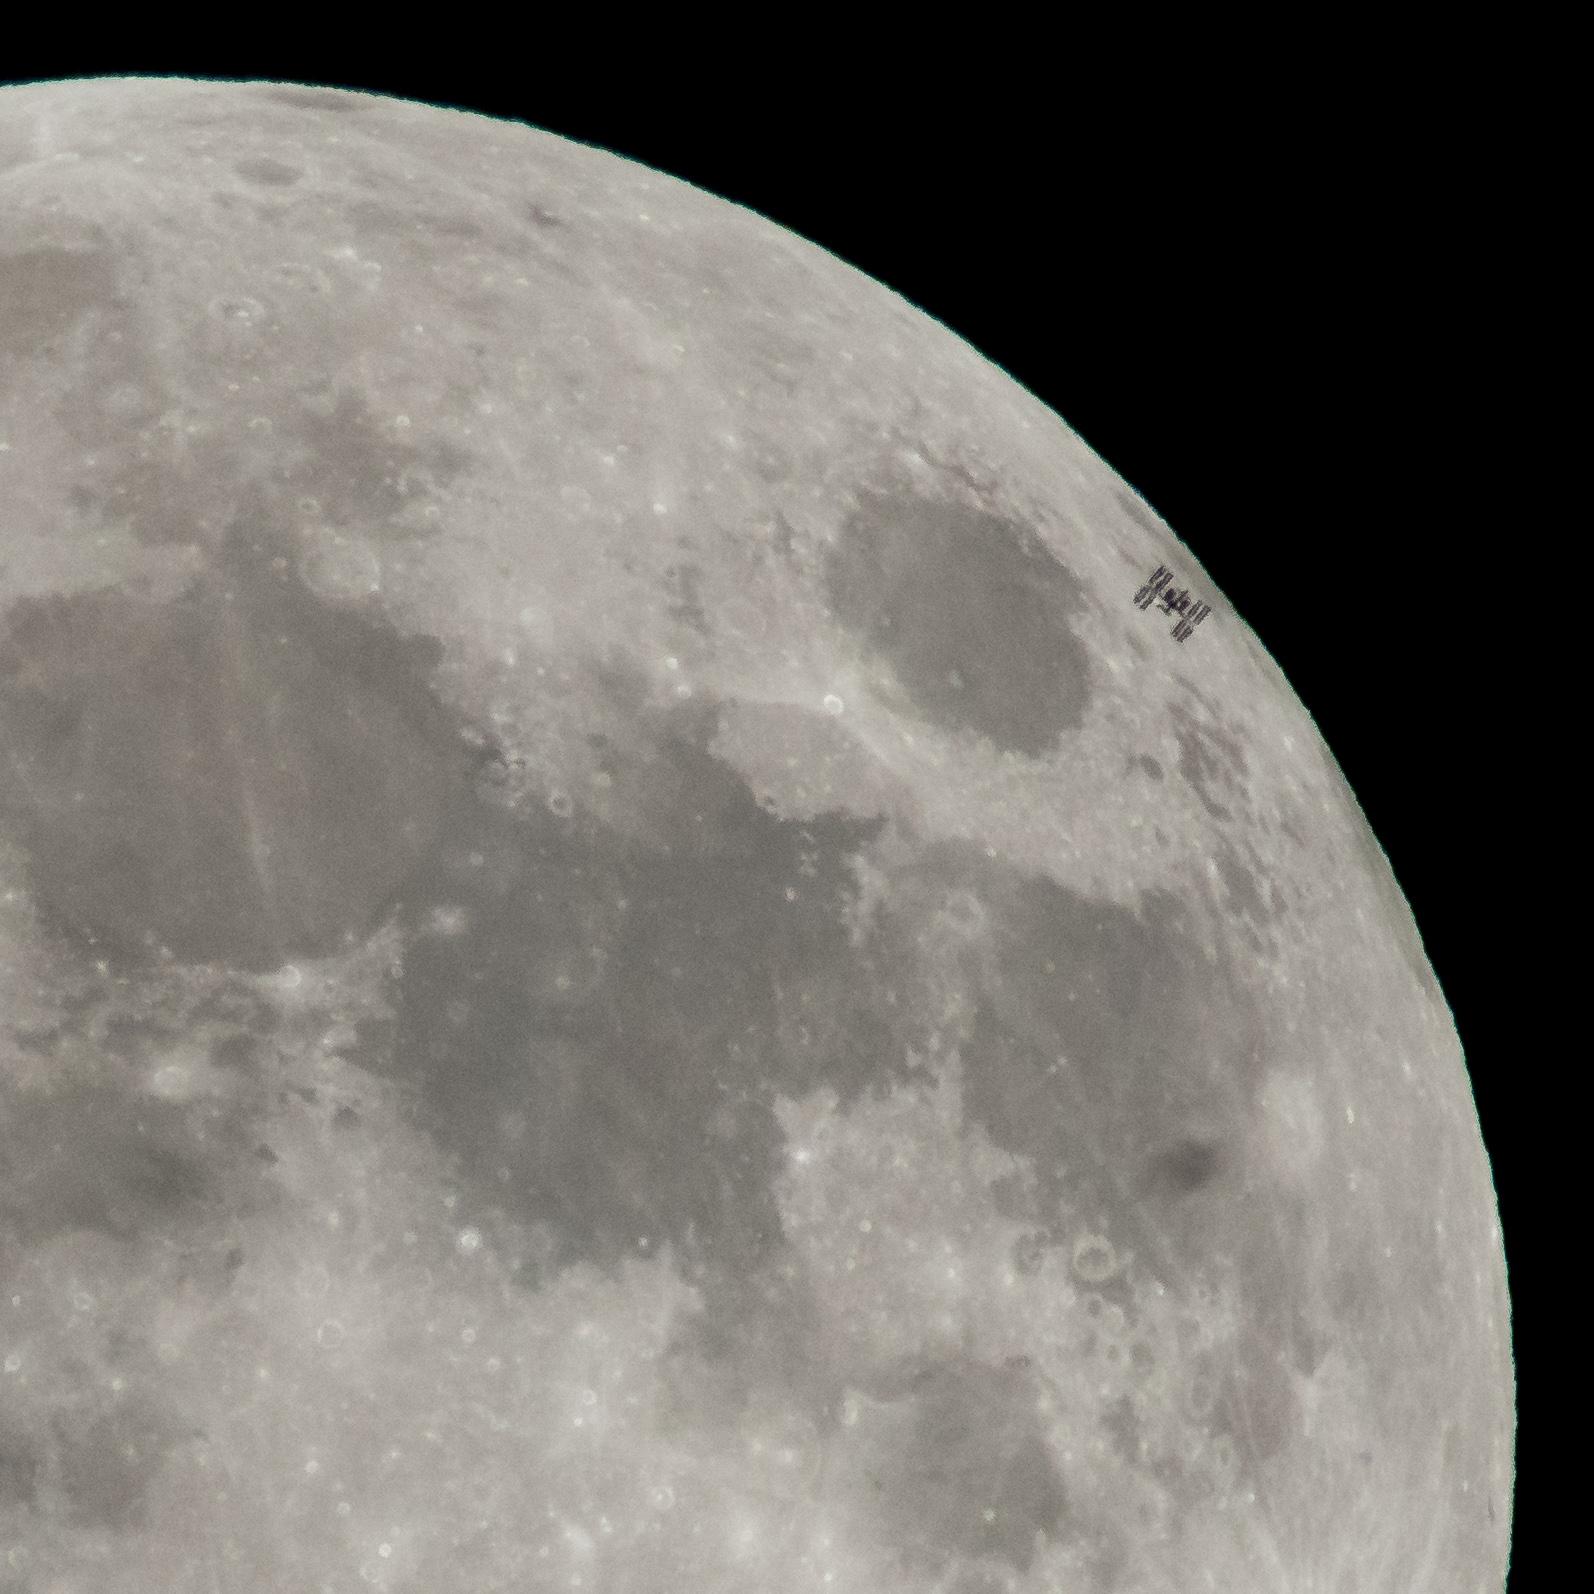 International Space Station Transits the Full Moon | NASA